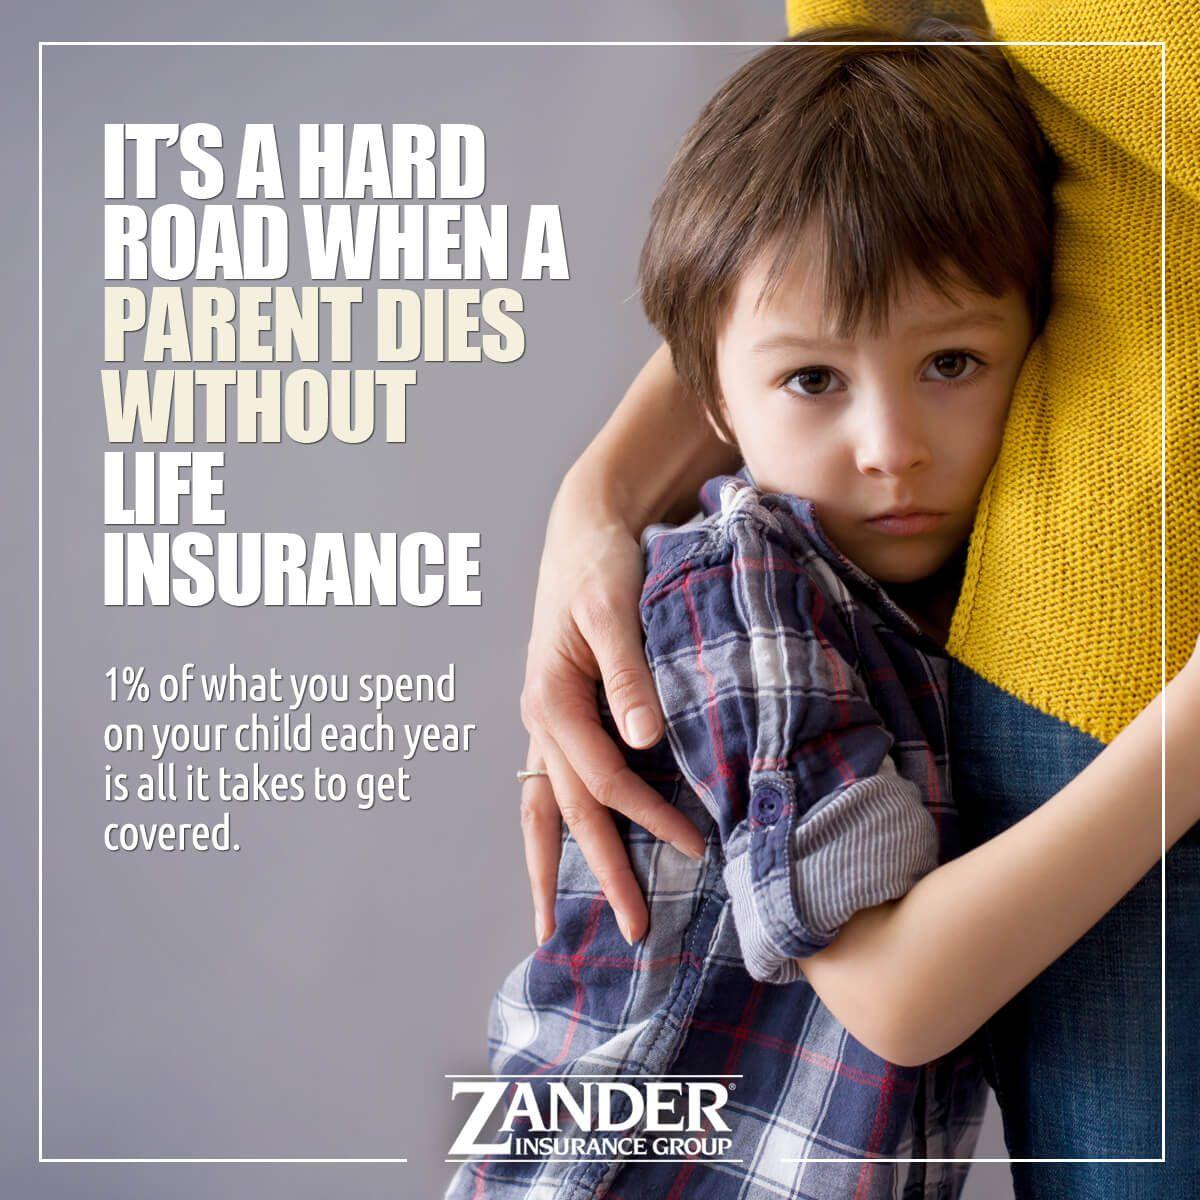 Pin by Zander Insurance on Life Insurance Group